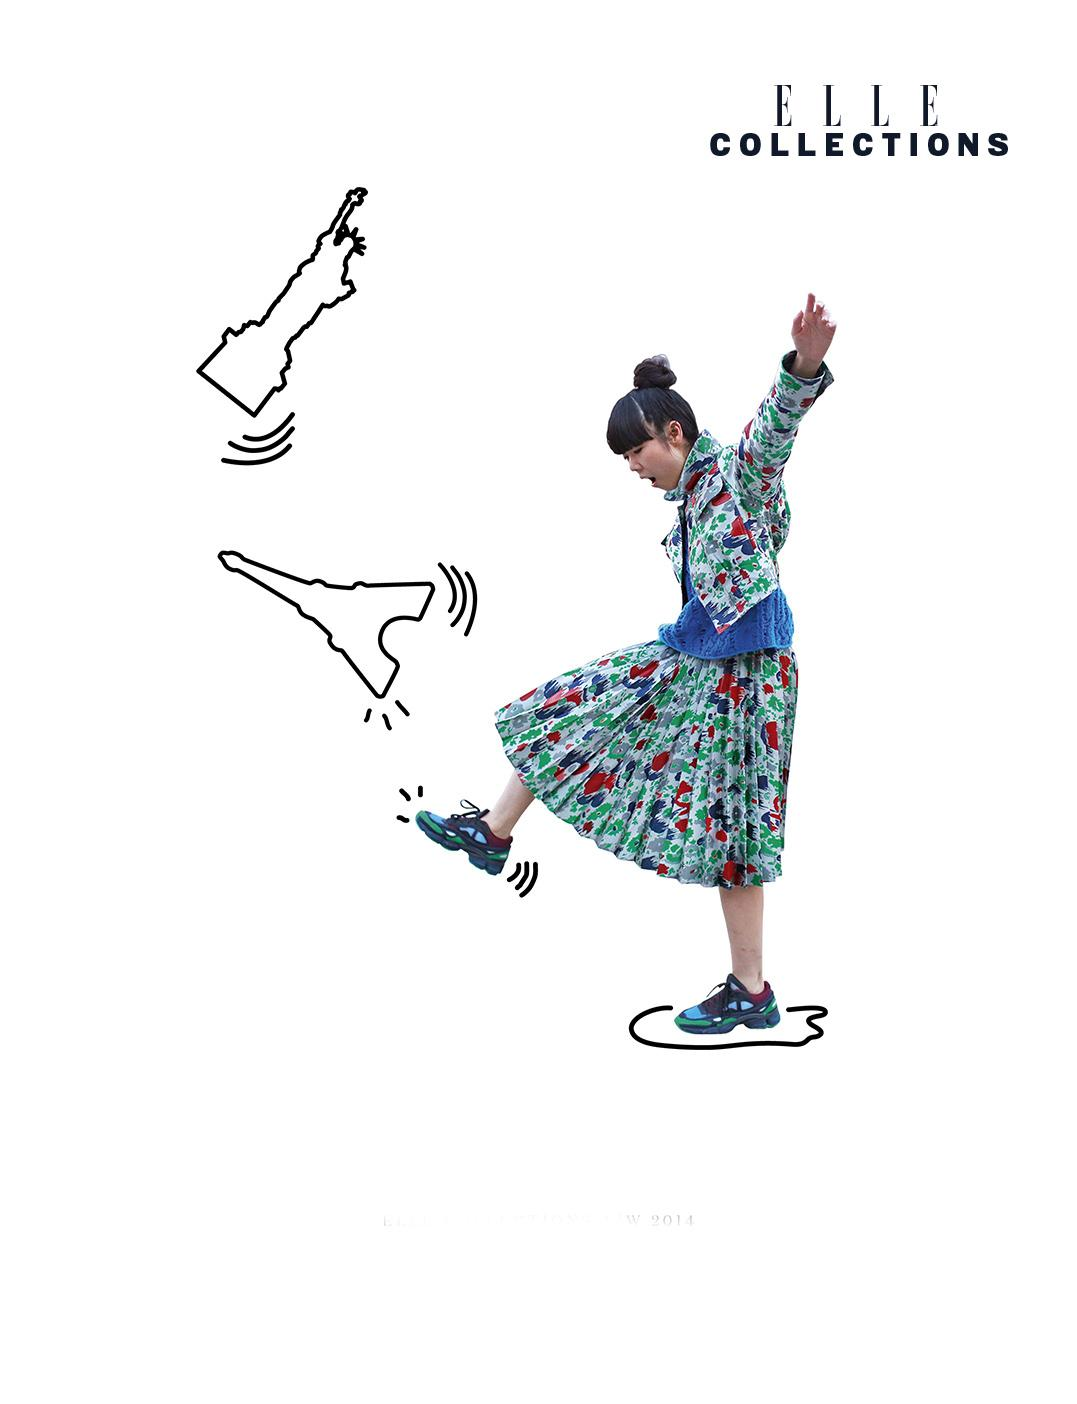 Street style's joyful reboot, featuring @susiebubble #ELLEcollections http://t.co/7tXCm9qTOQ http://t.co/2QWa4nPJfN